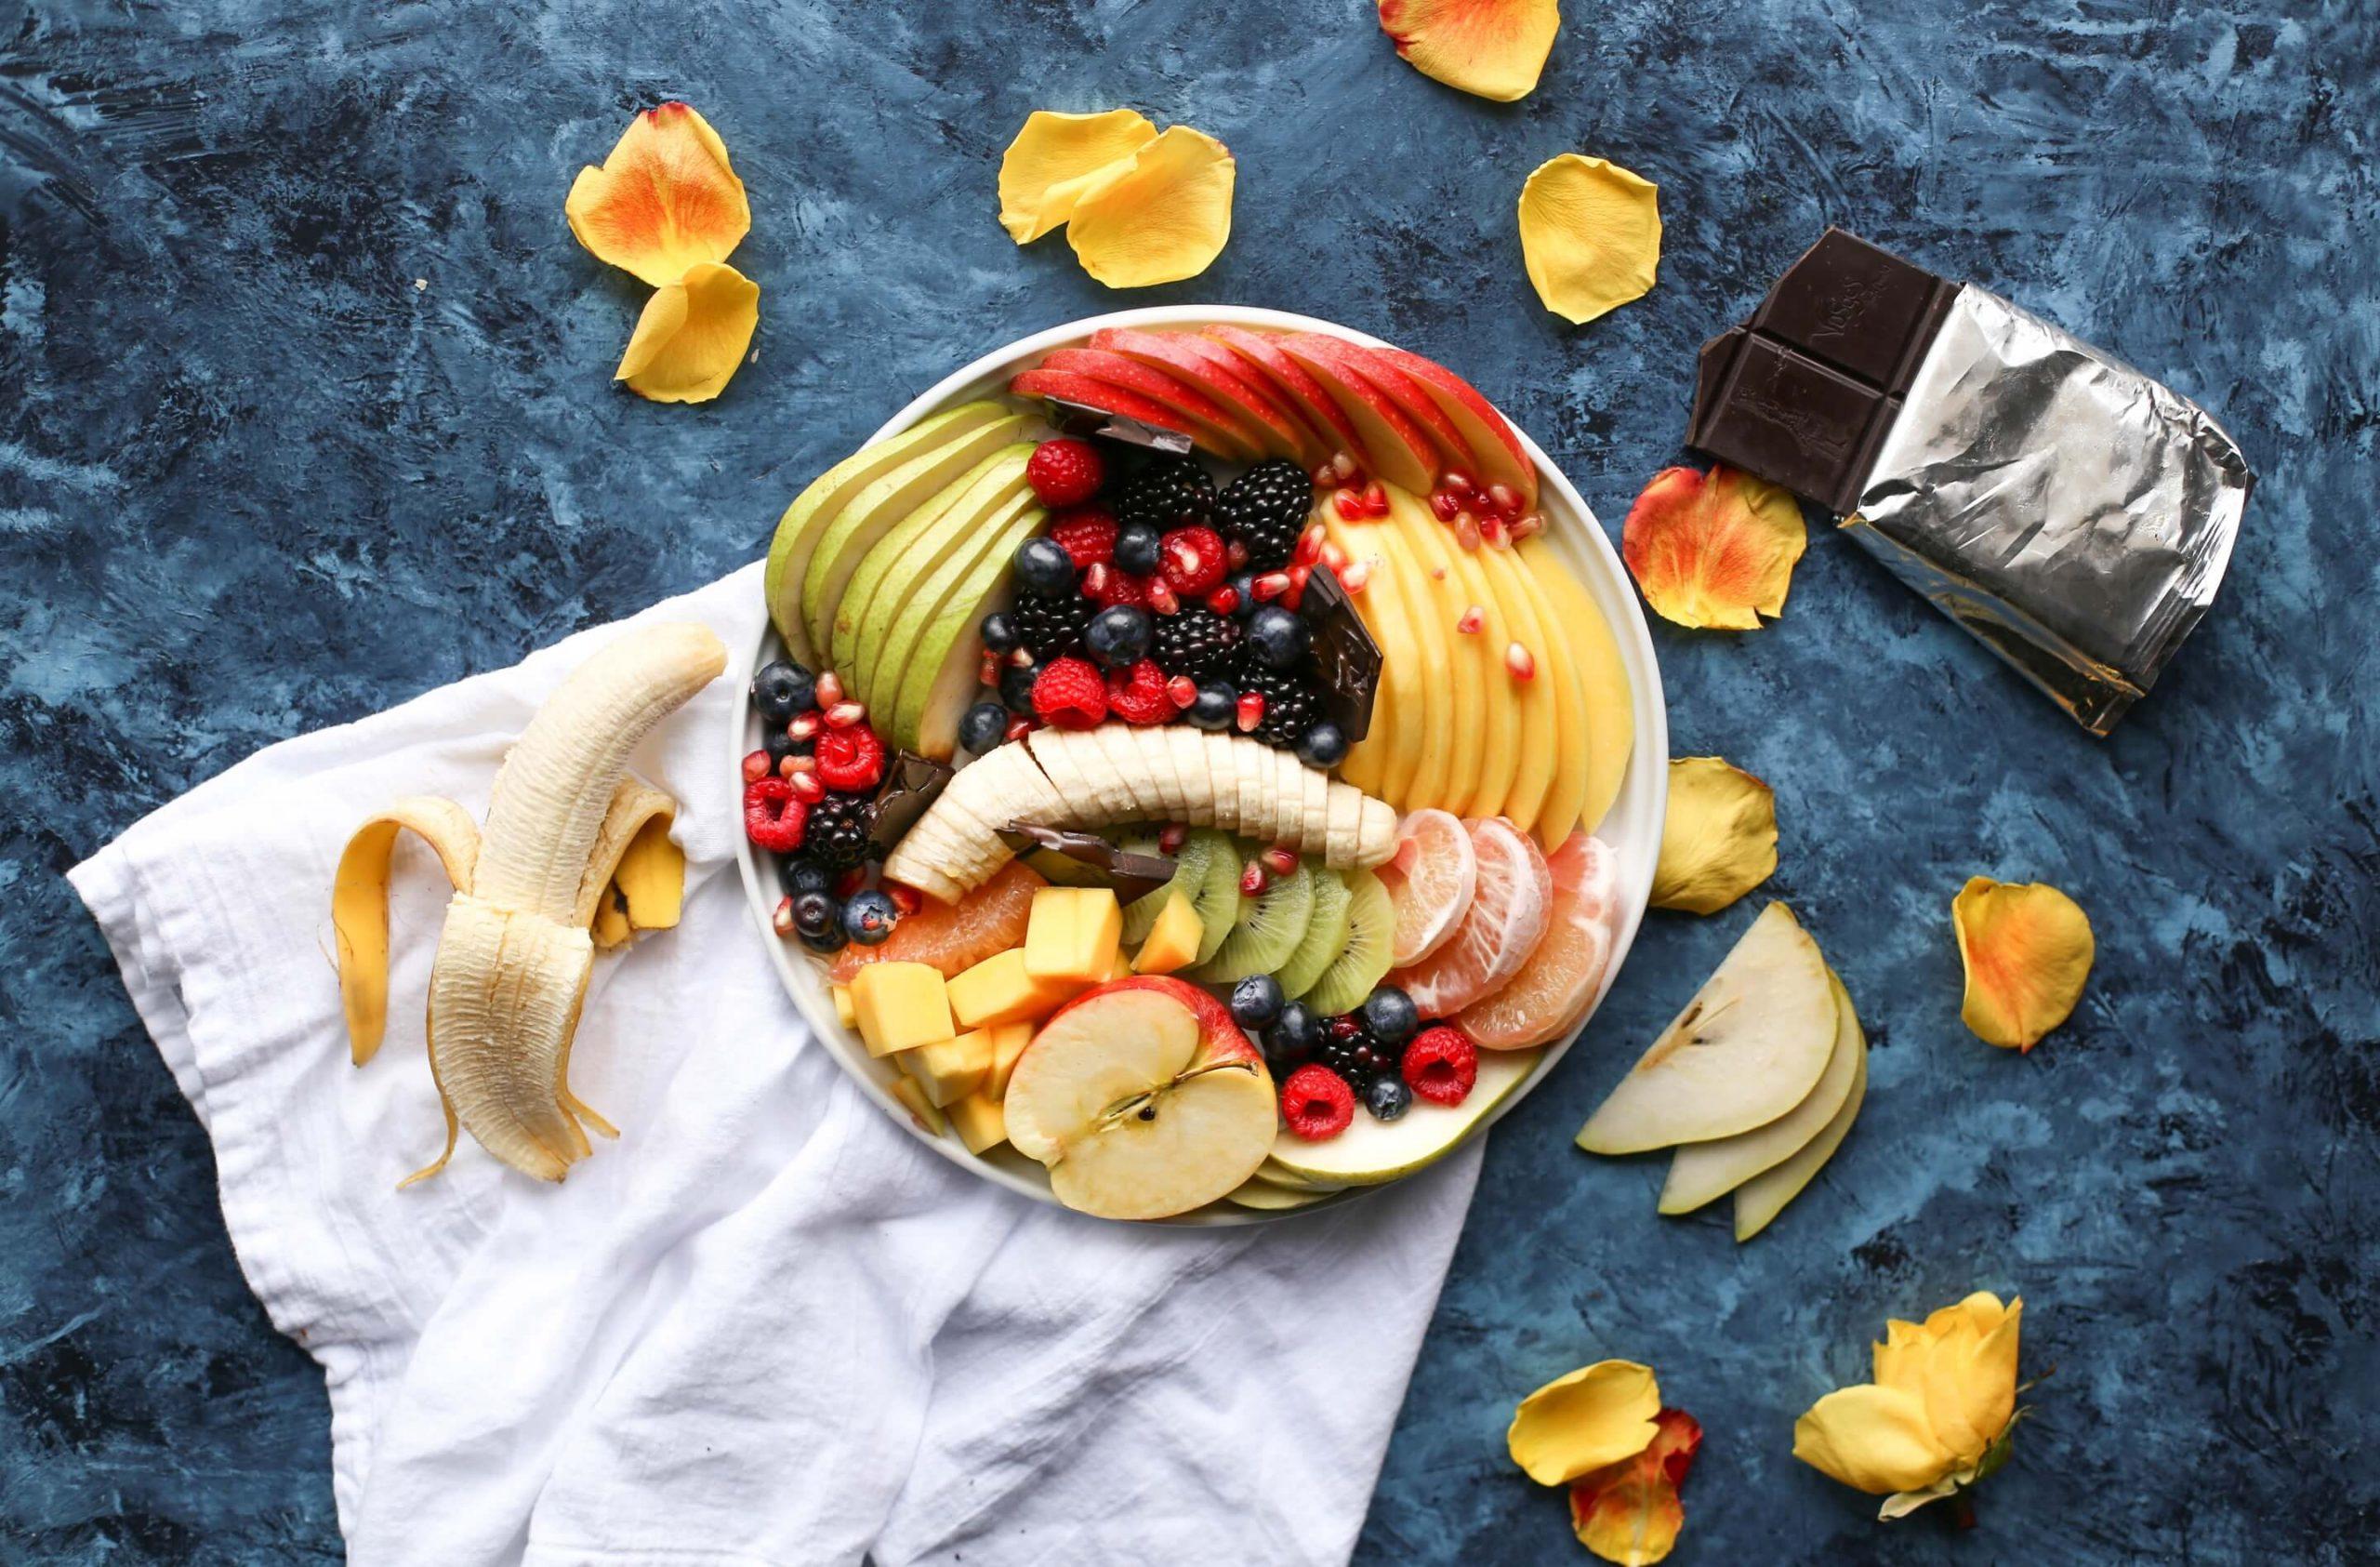 Fruit Platter with Banana, Mango, Berries and Orange